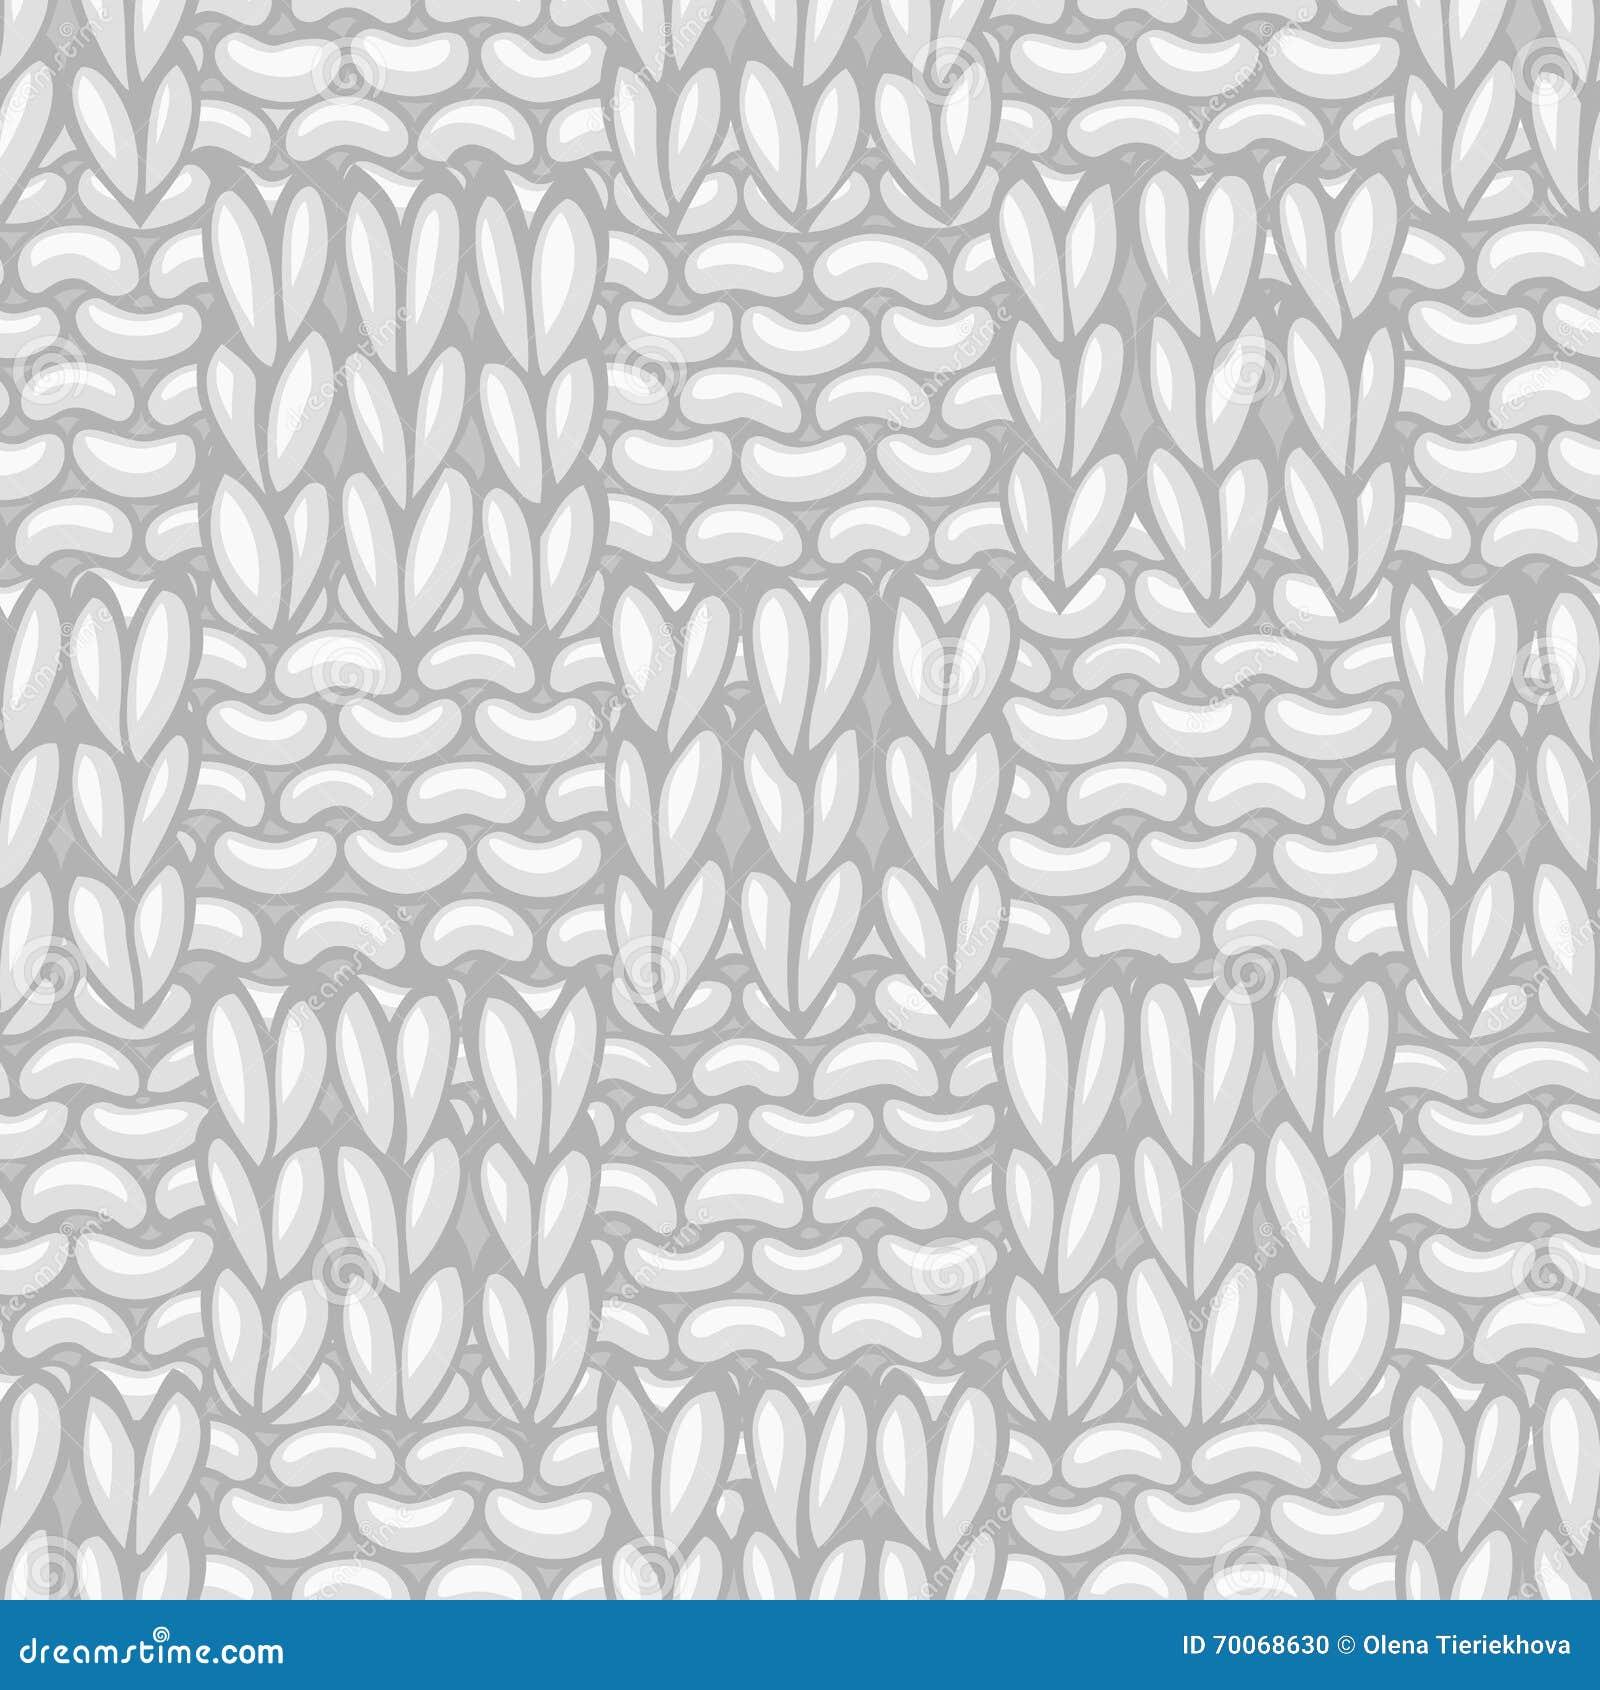 Basketweave Stitch. stock vector. Illustration of handmade - 70068630